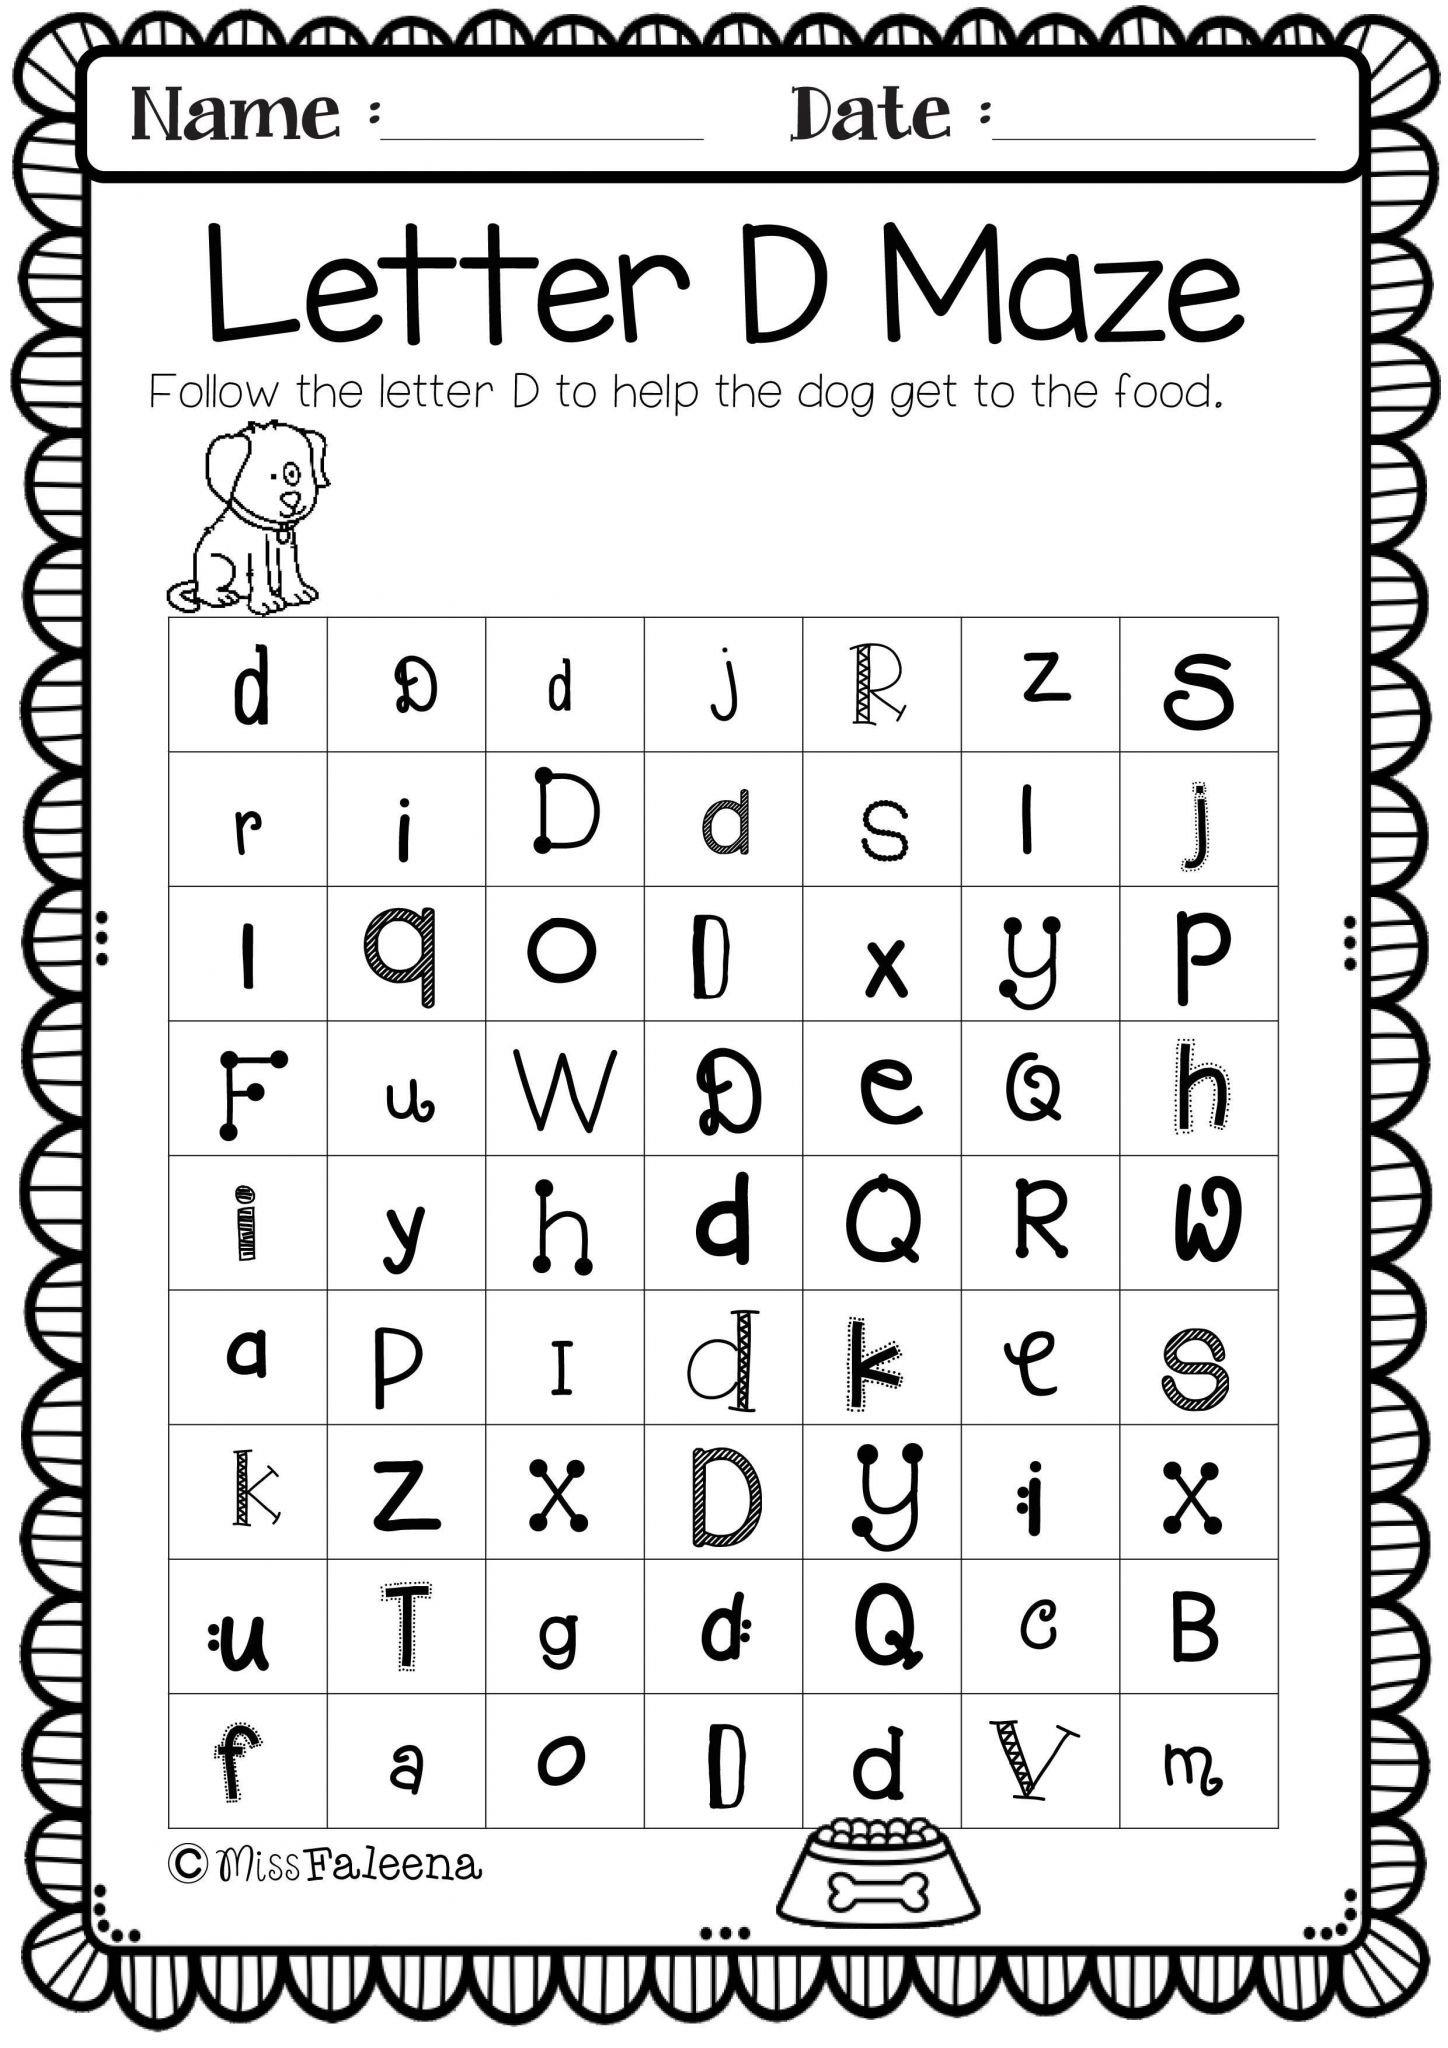 Miss Kindergarten Worksheets  Briefencounters As Well As Miss Kindergarten Worksheets